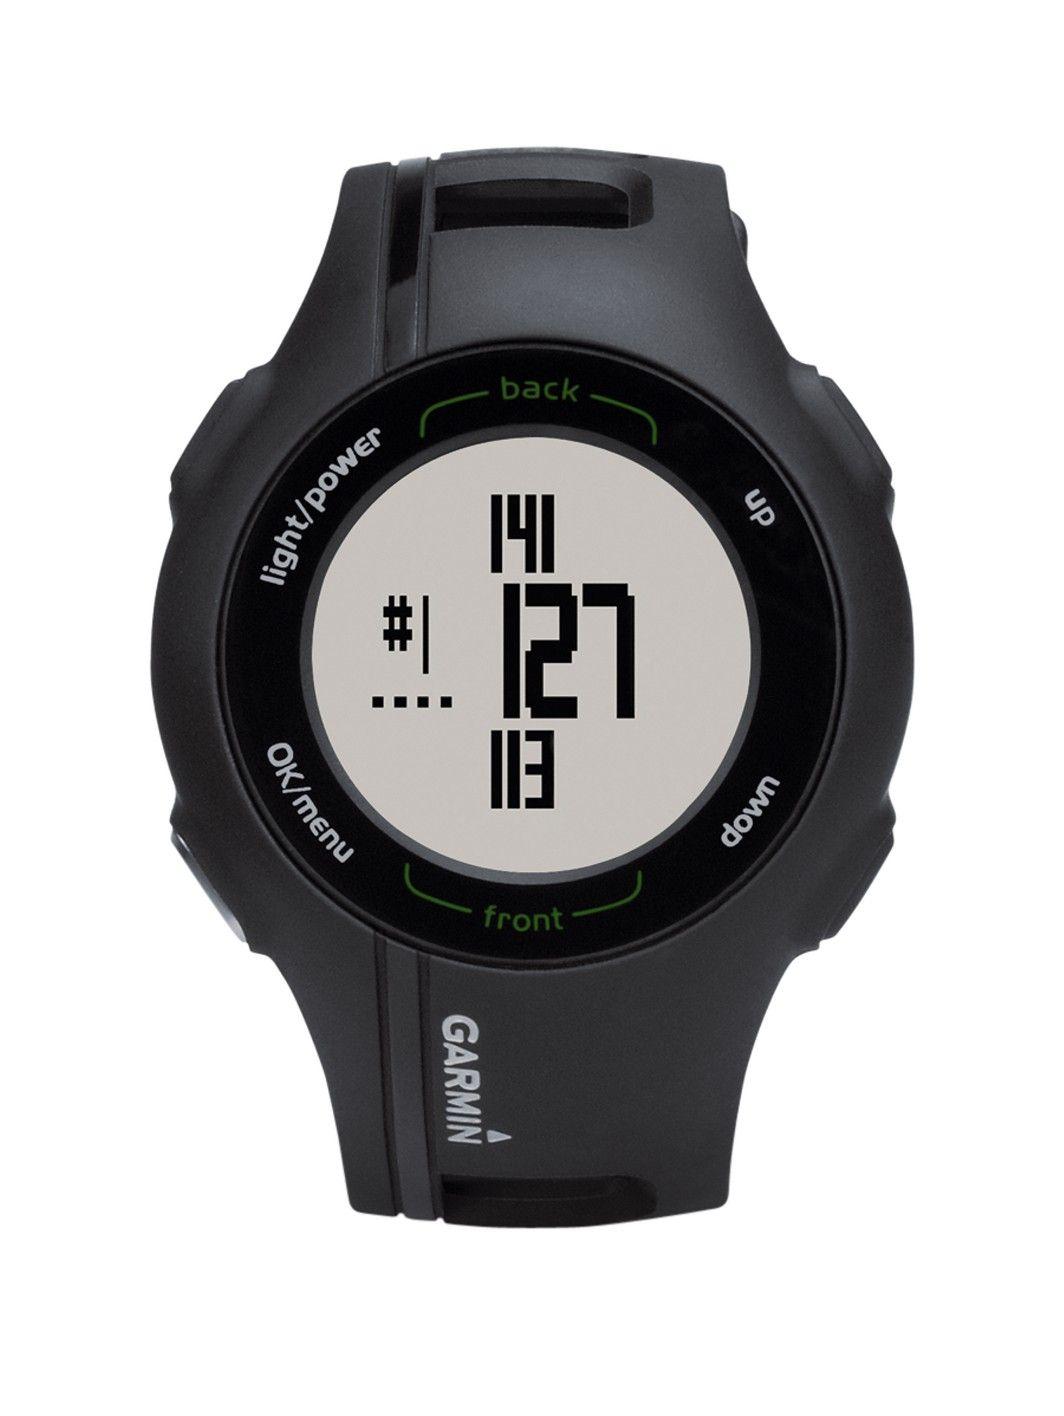 Garmin Fenix 2 Multisport Training Navigating GPS Watch